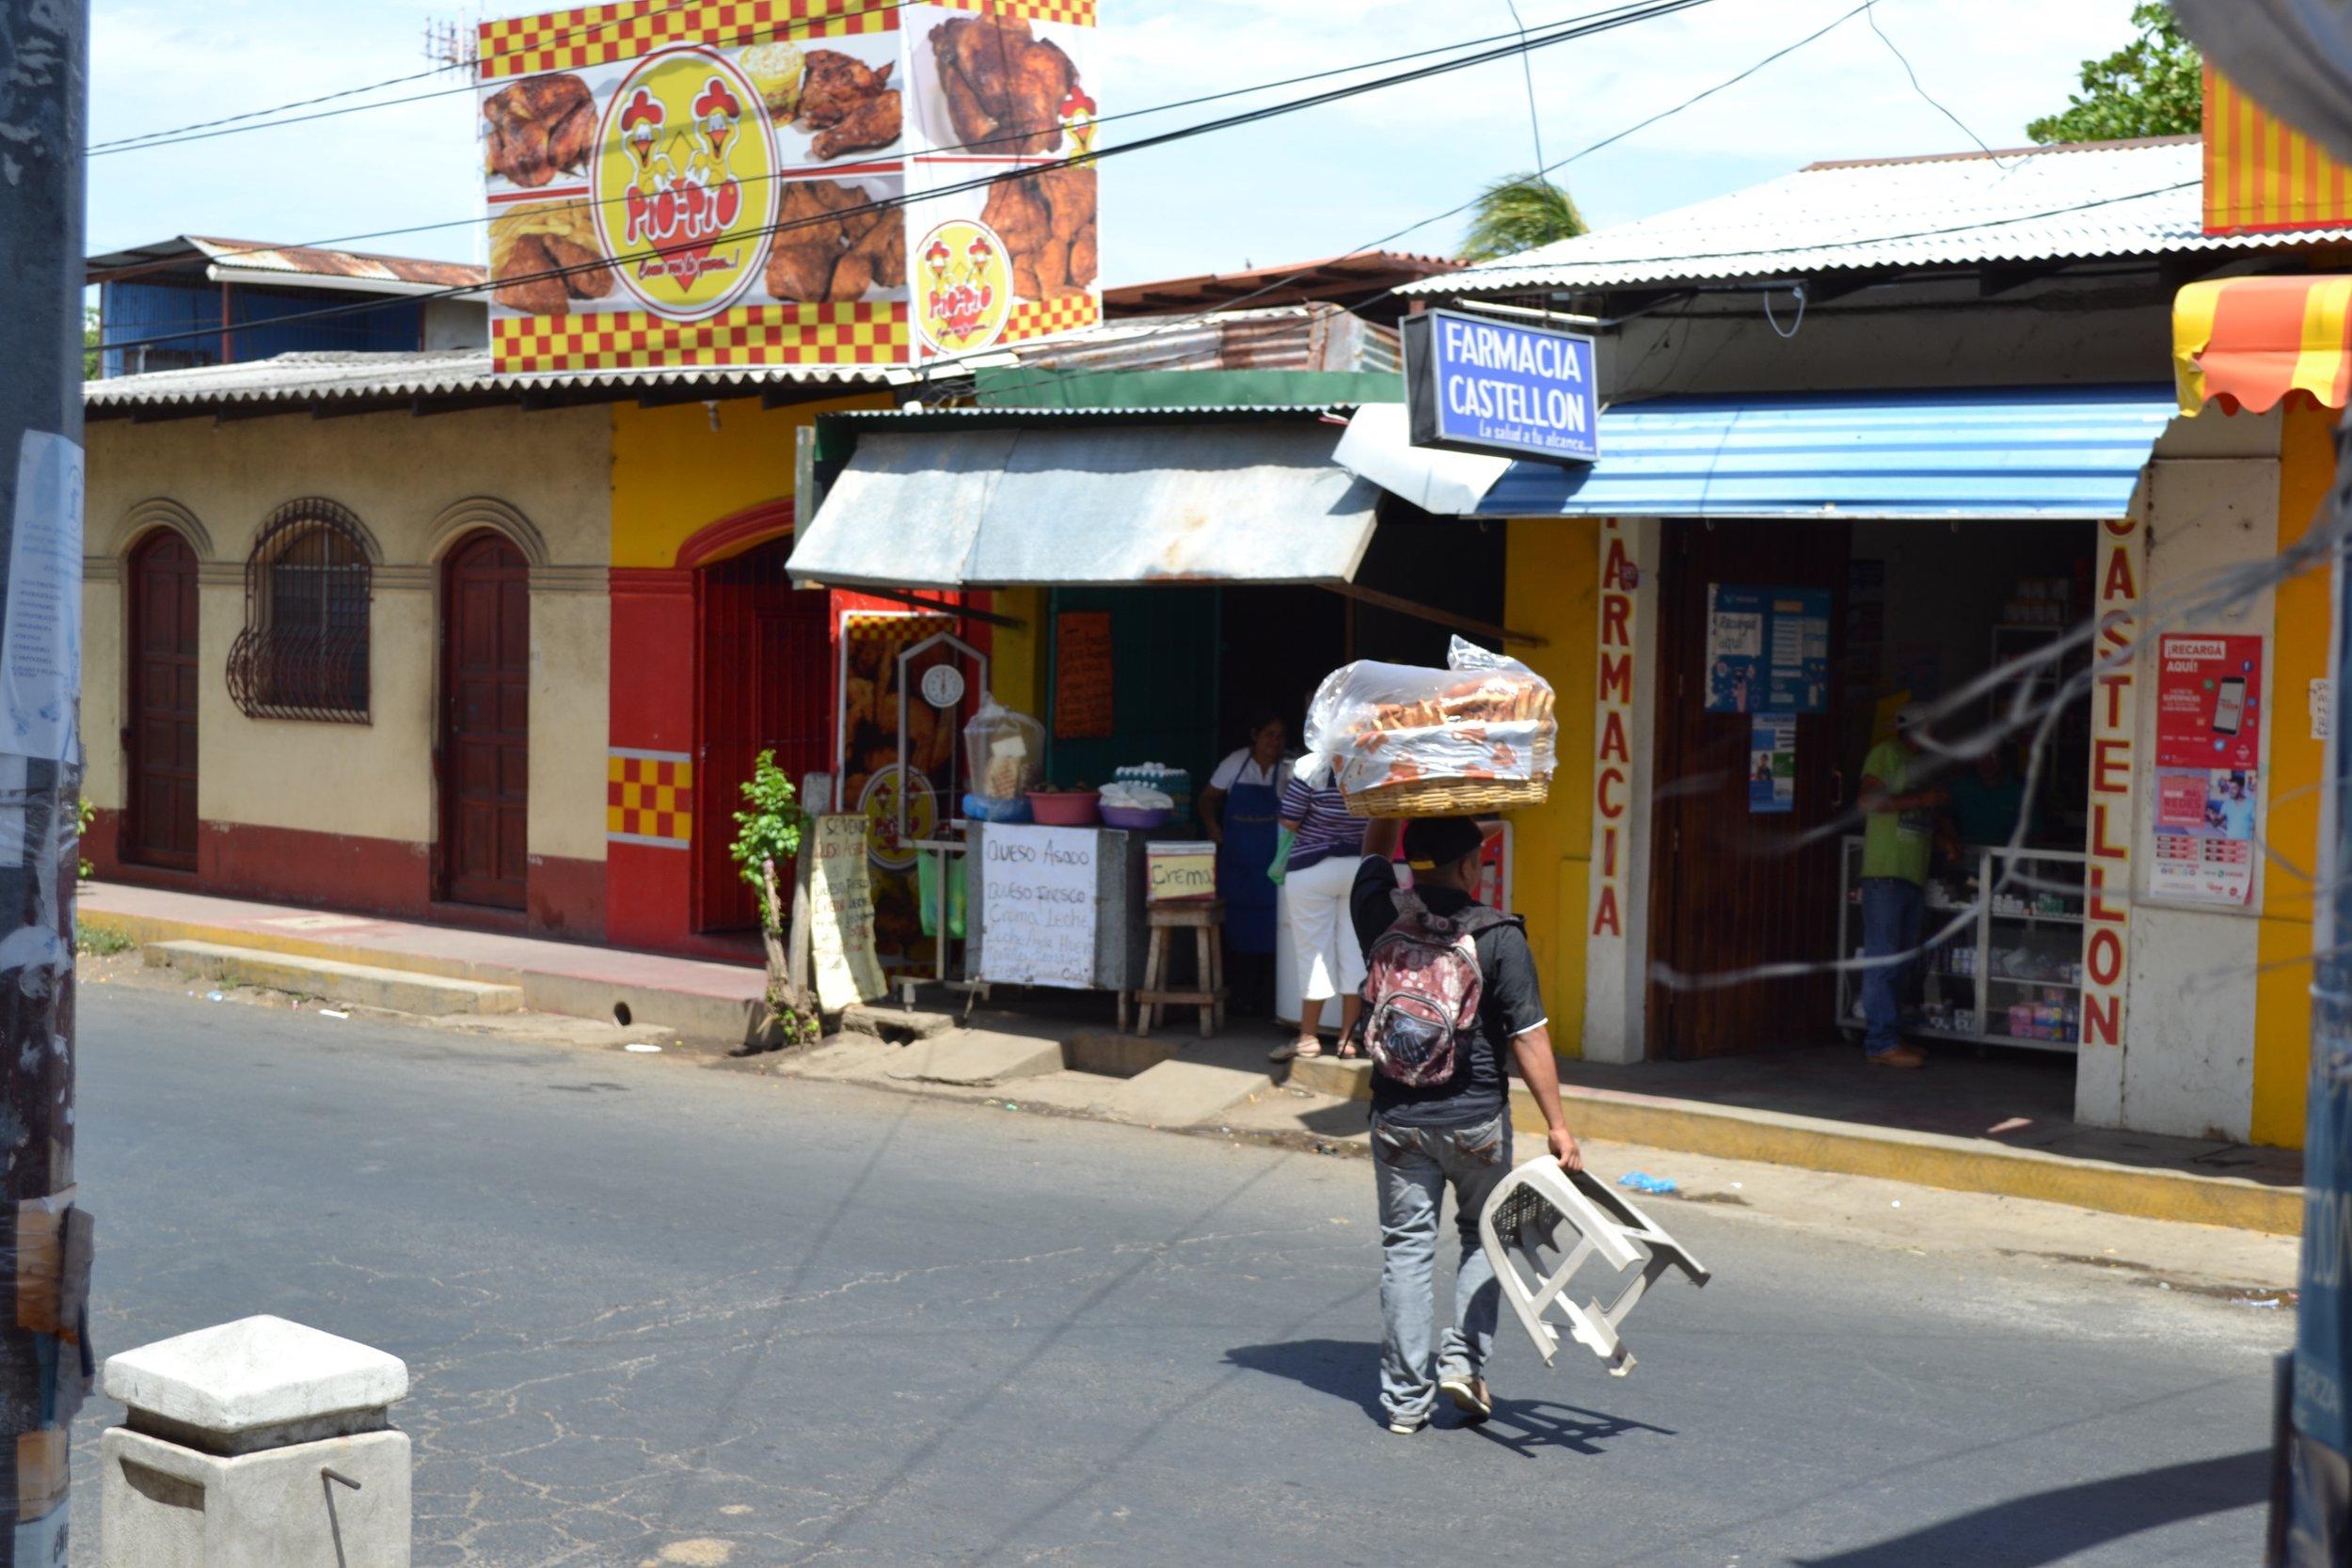 Bev Nicaragua 1. Photo by Ana.jpg